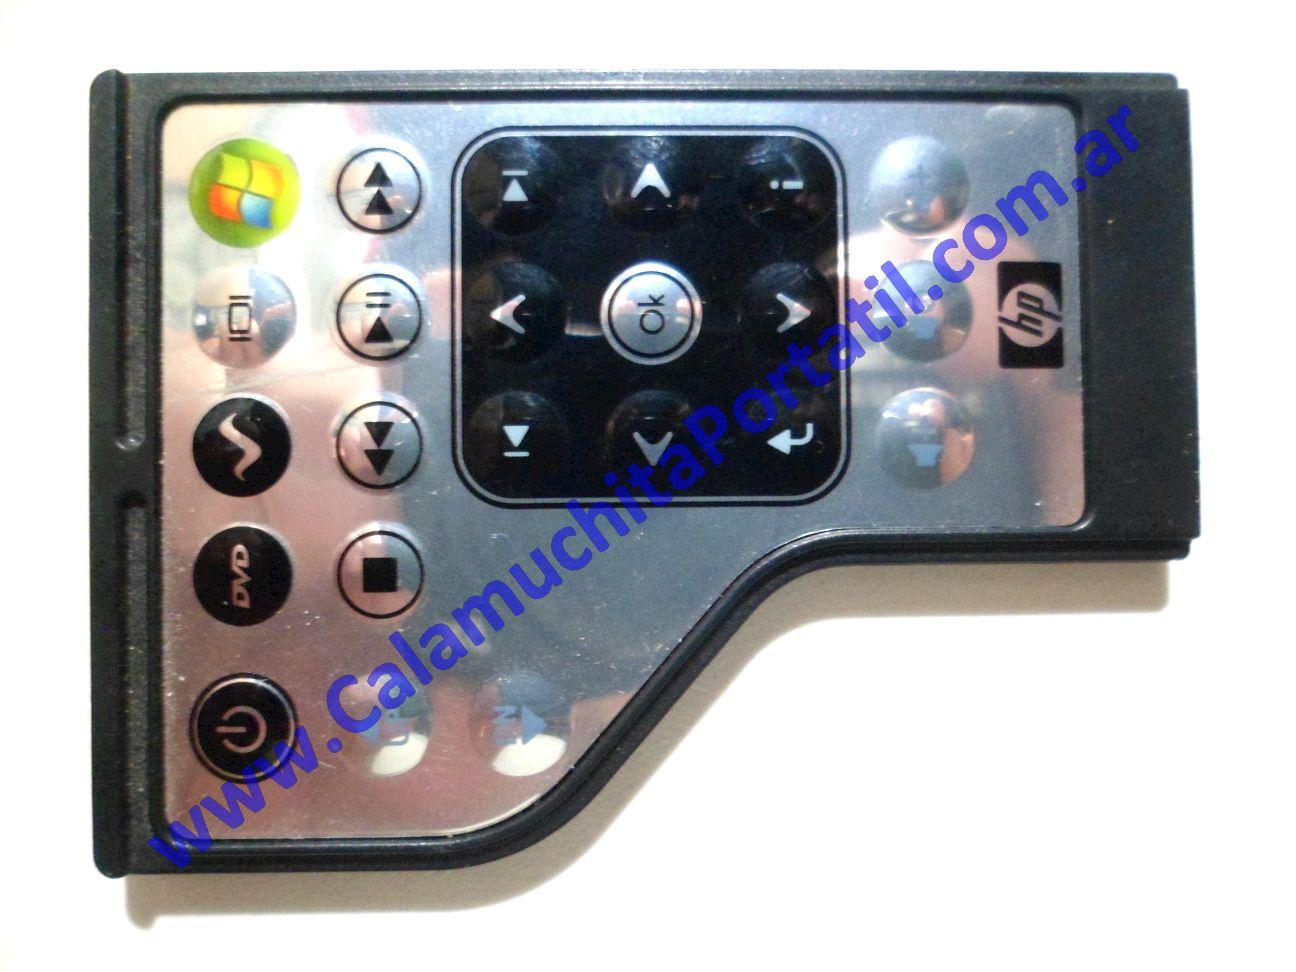 0133ACR Control Remoto Hewlett Packard Pavilion DV4-1313DX / NM237UAR#ABA